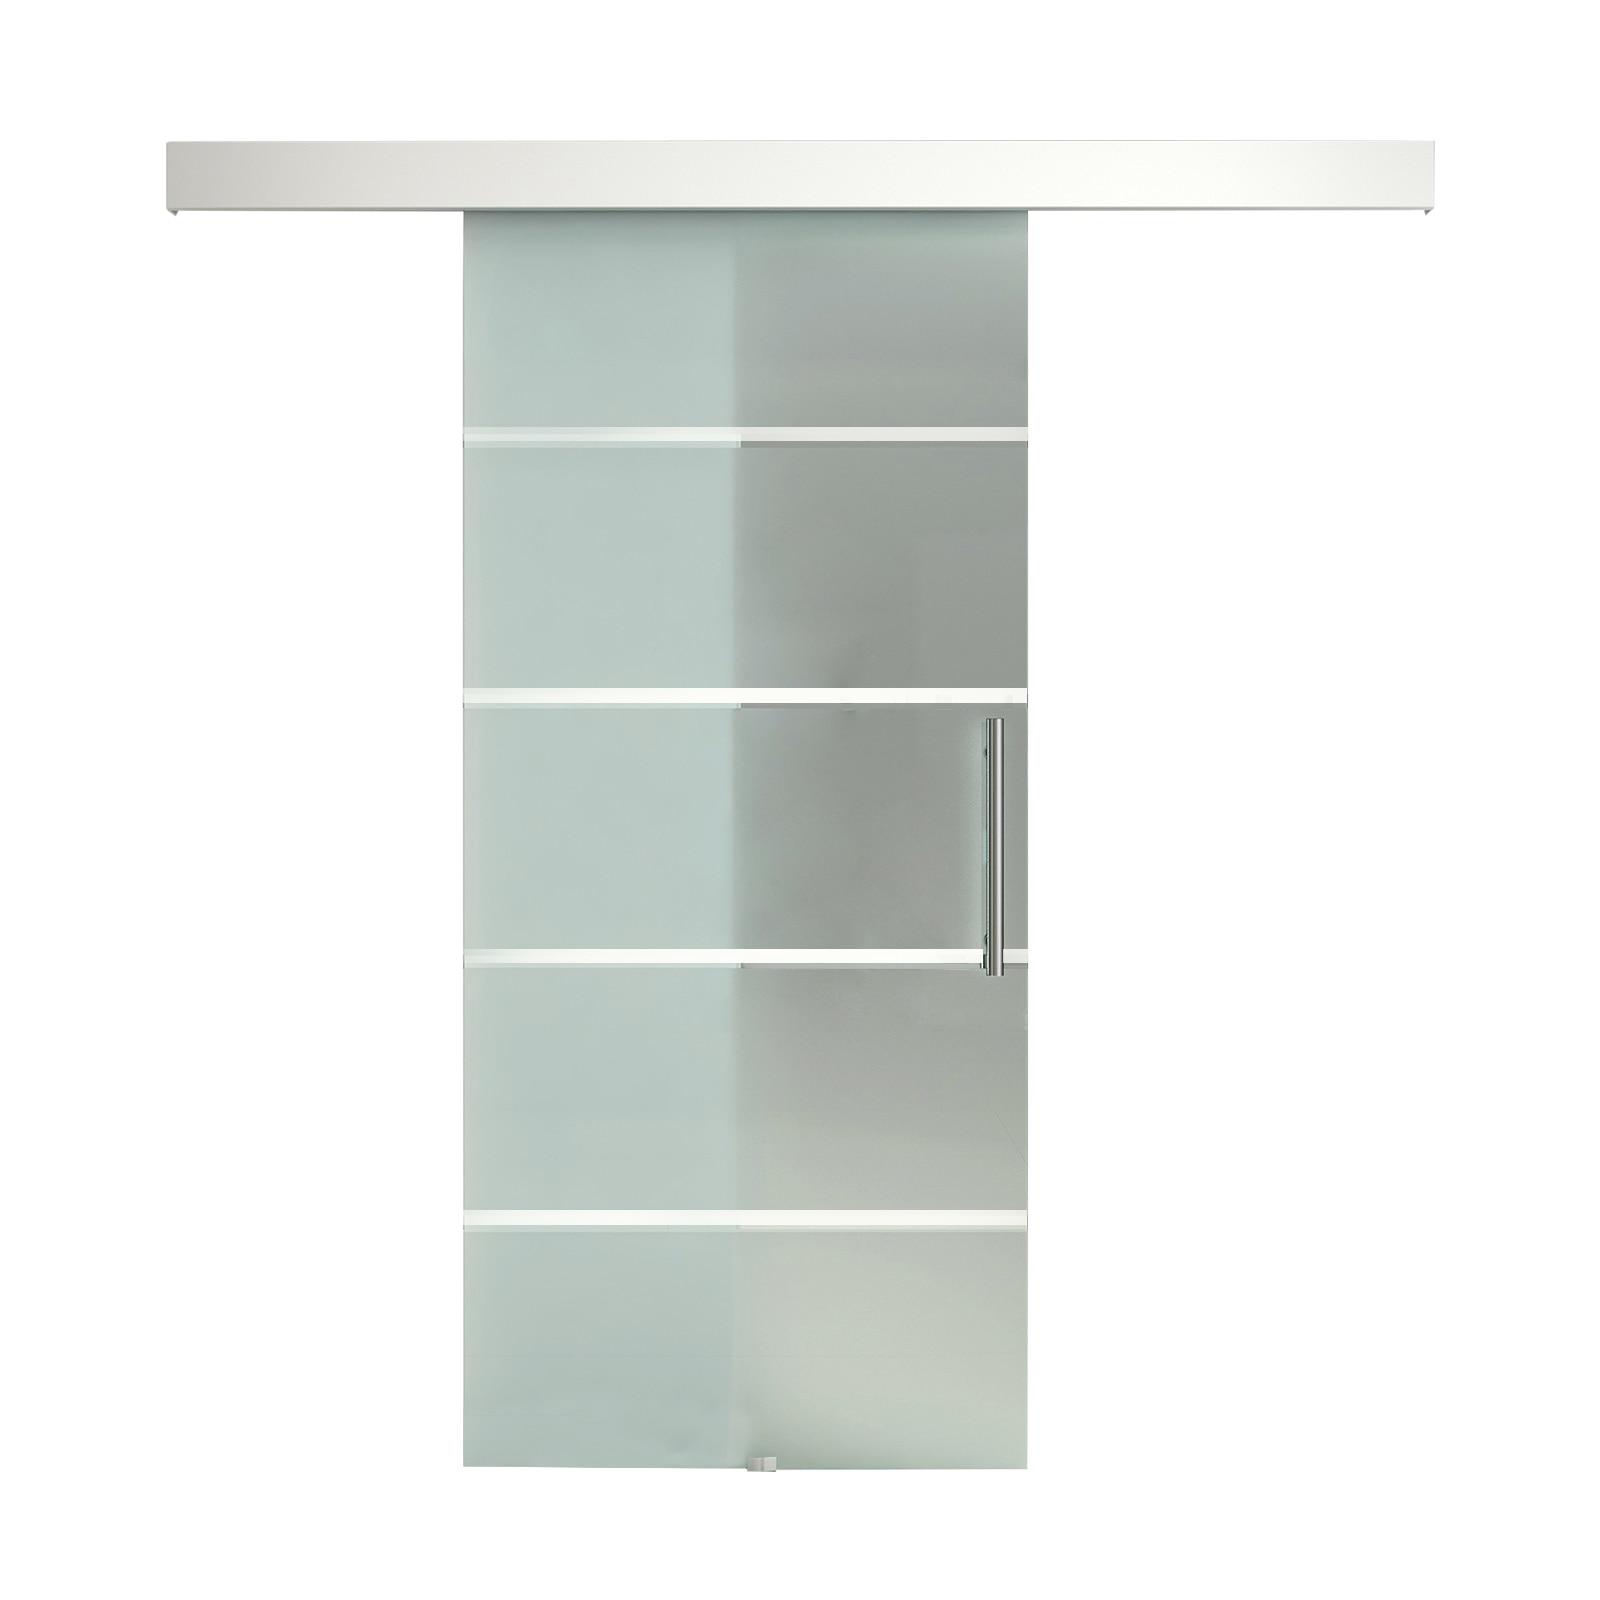 HOMCOM Frosted Glass Sliding Door Track Silent Handle Interior 200 × 213cm